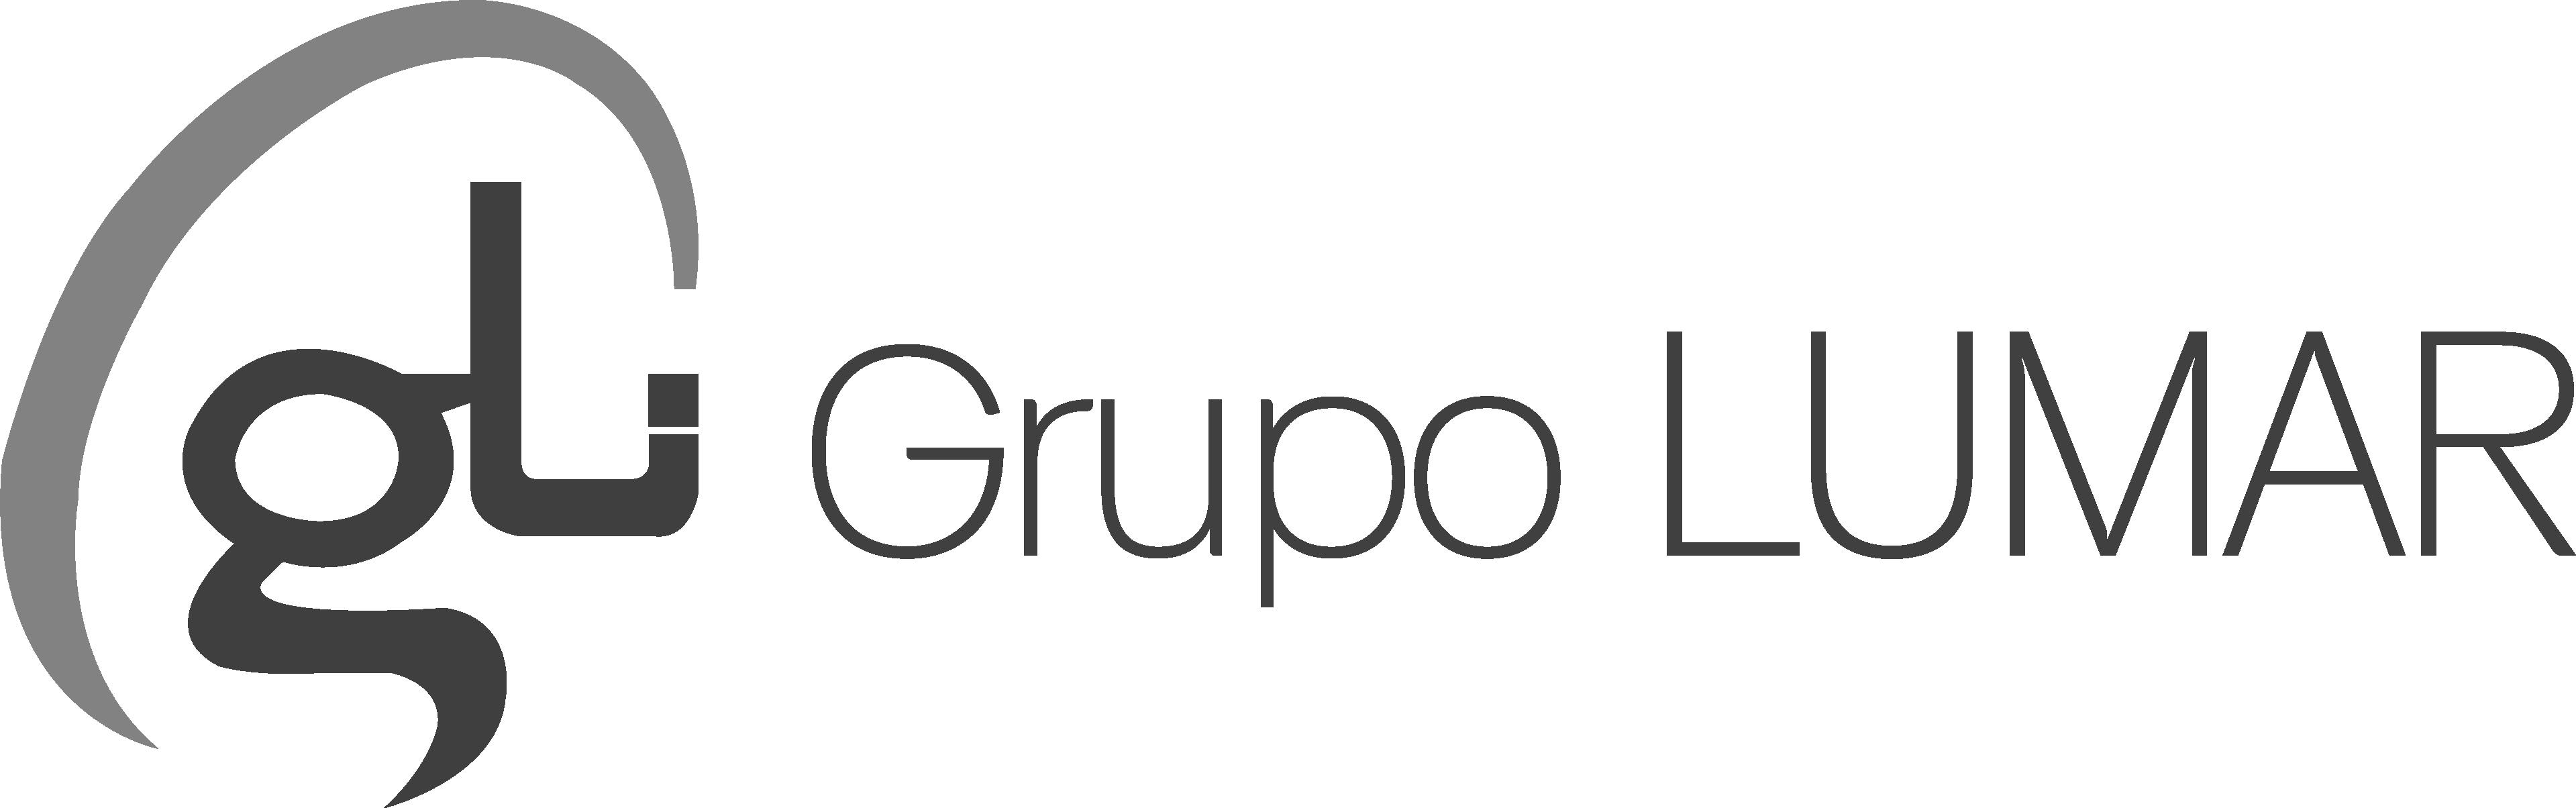 Grupo empresarial español